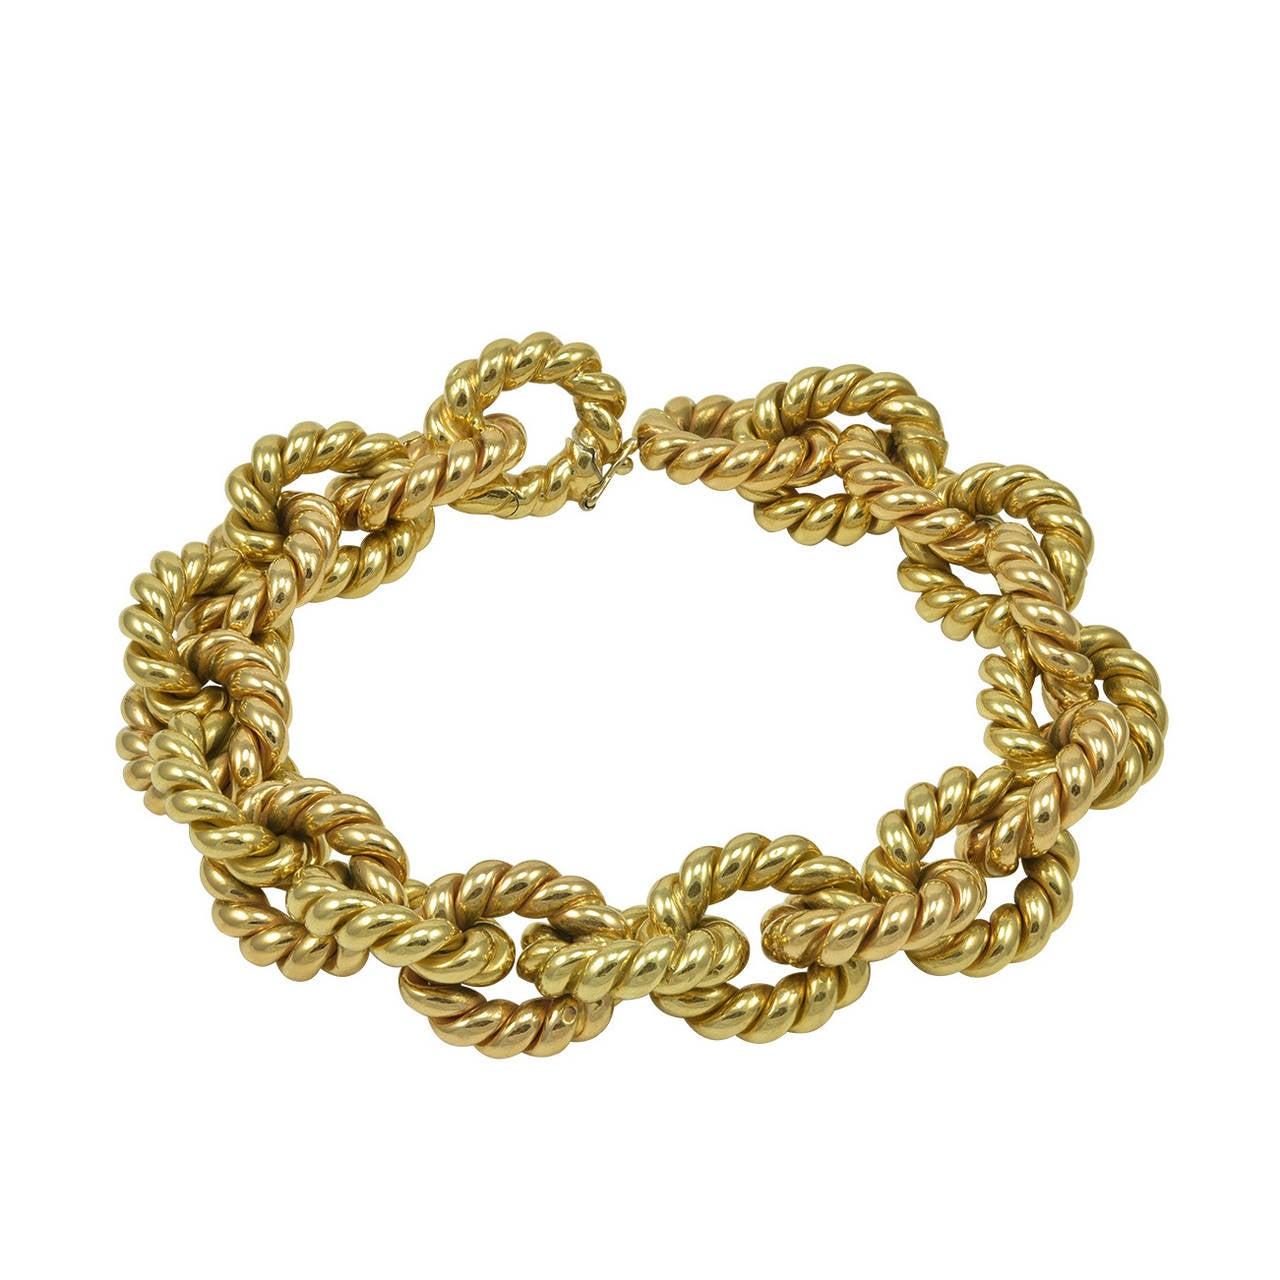 Classic Italian Textured Gold Link Bracelet